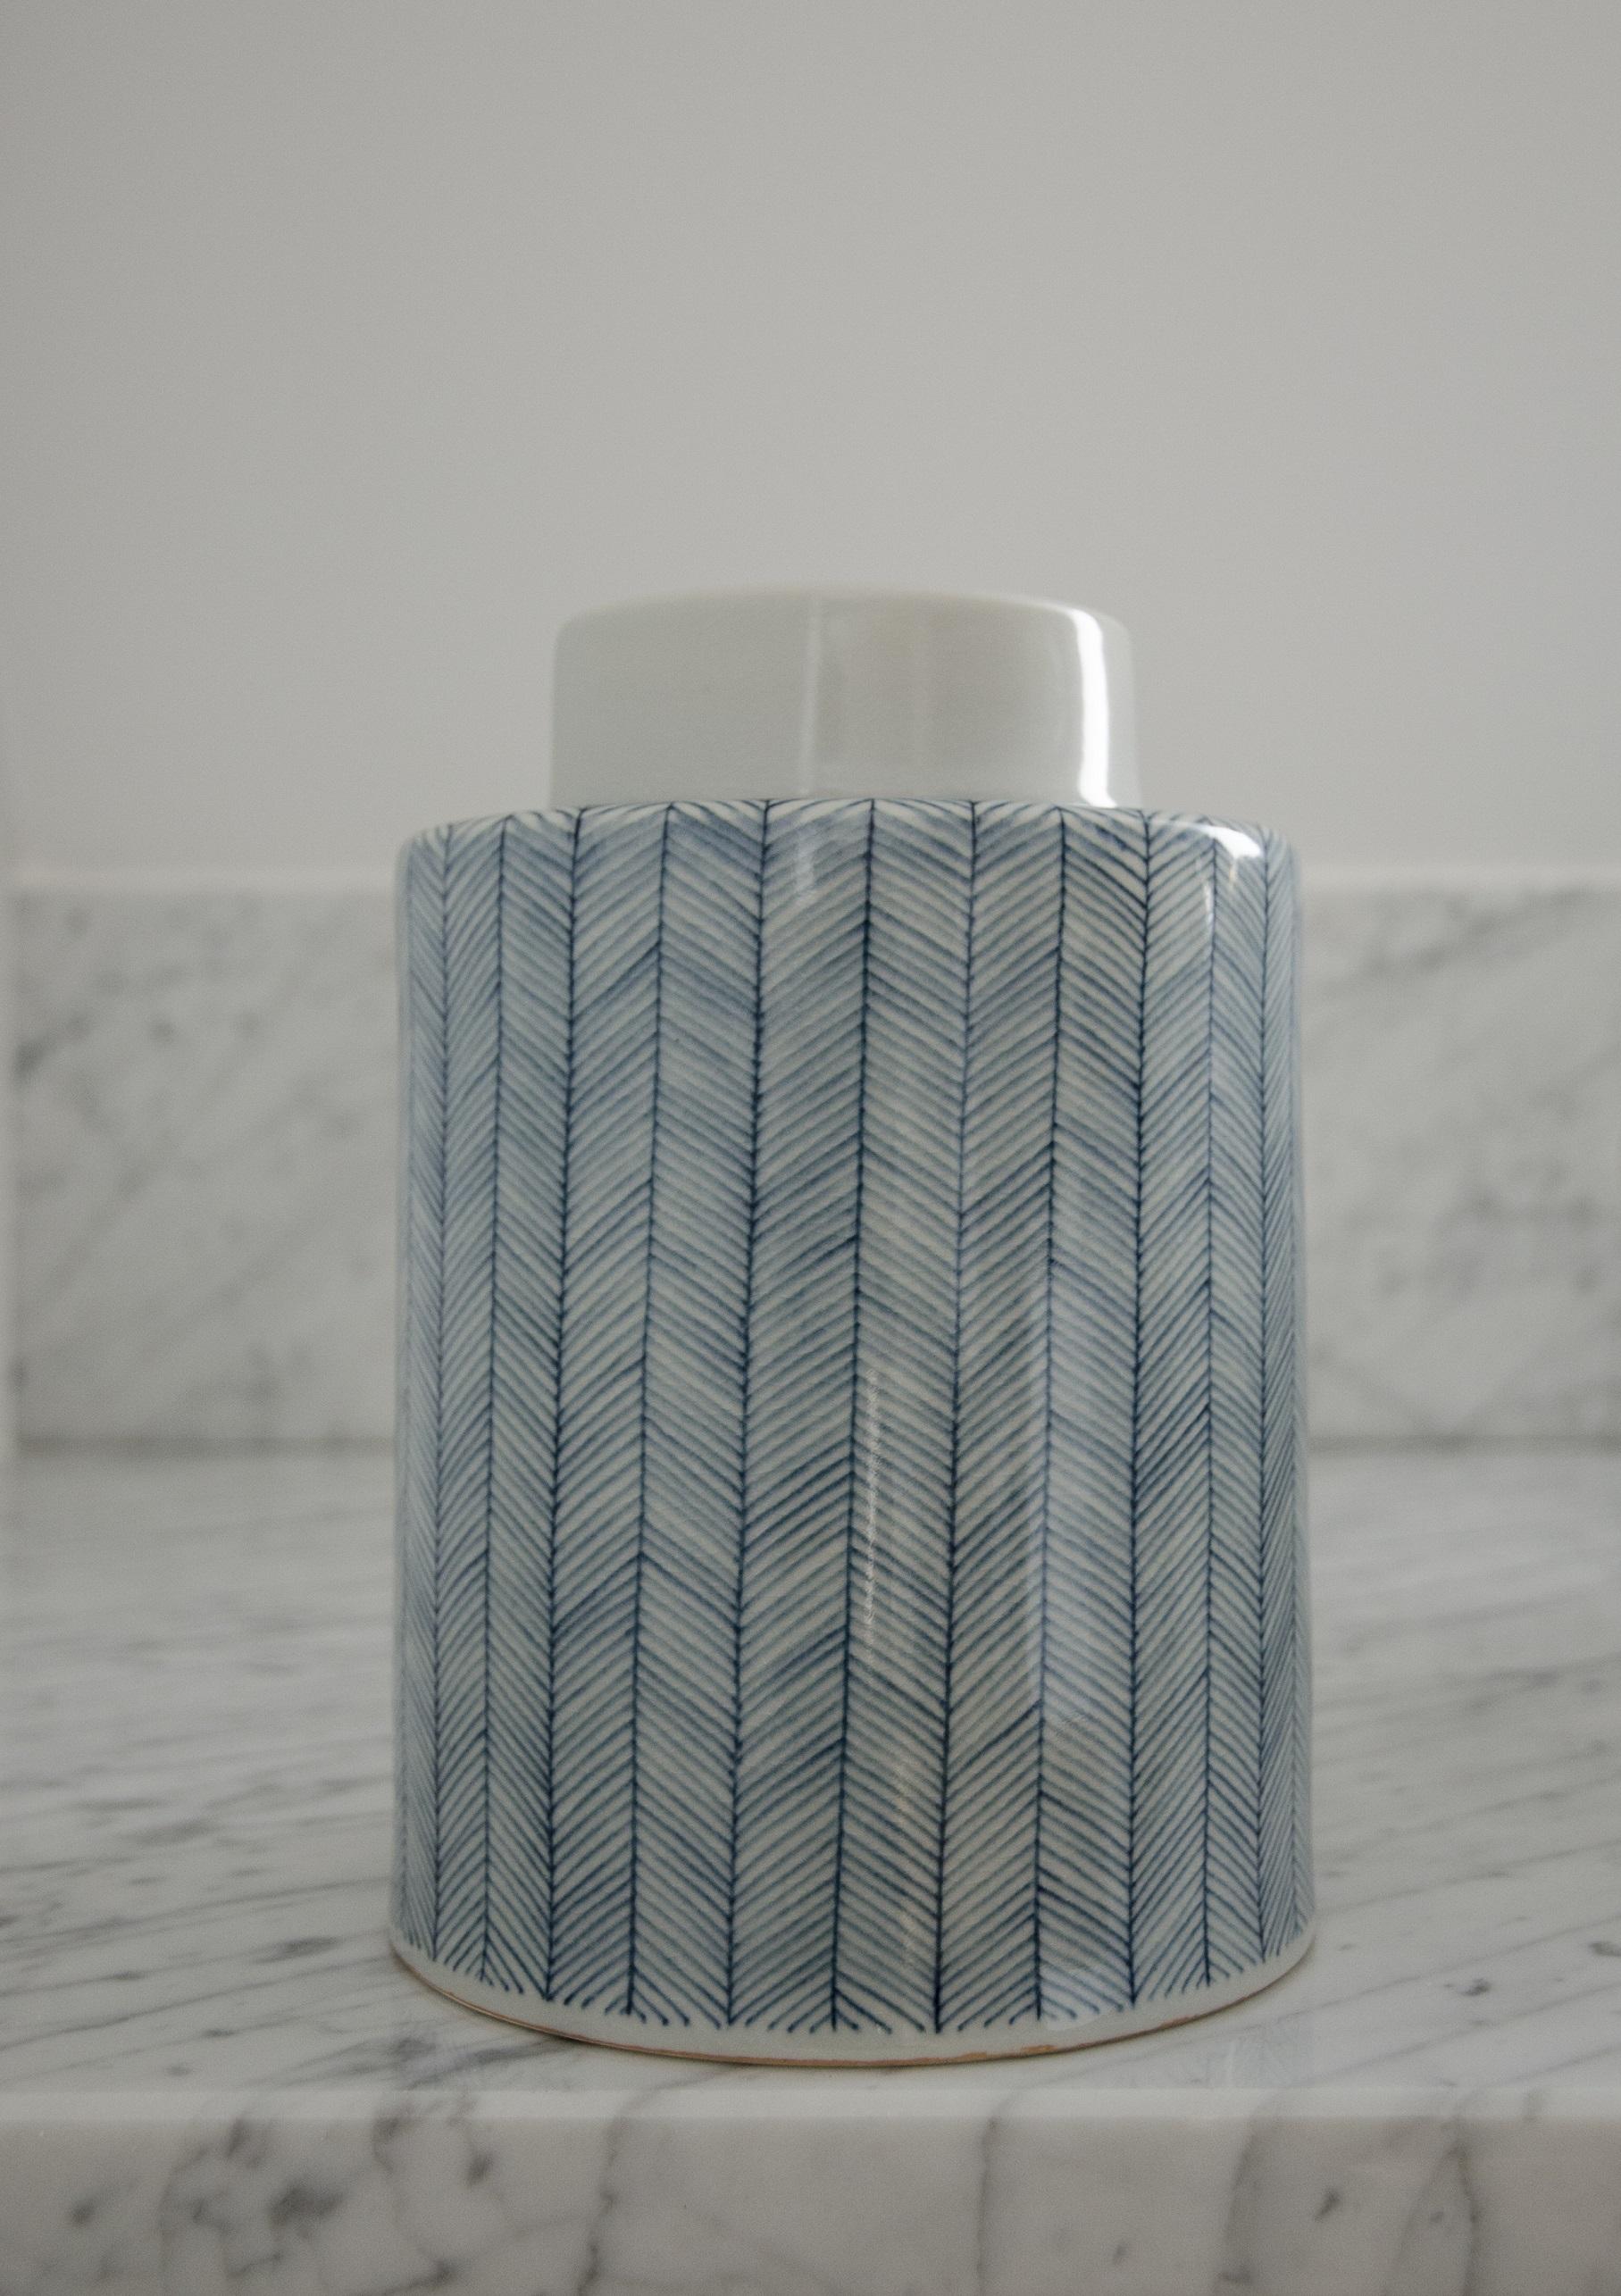 Tweed keramikburk – Indigo